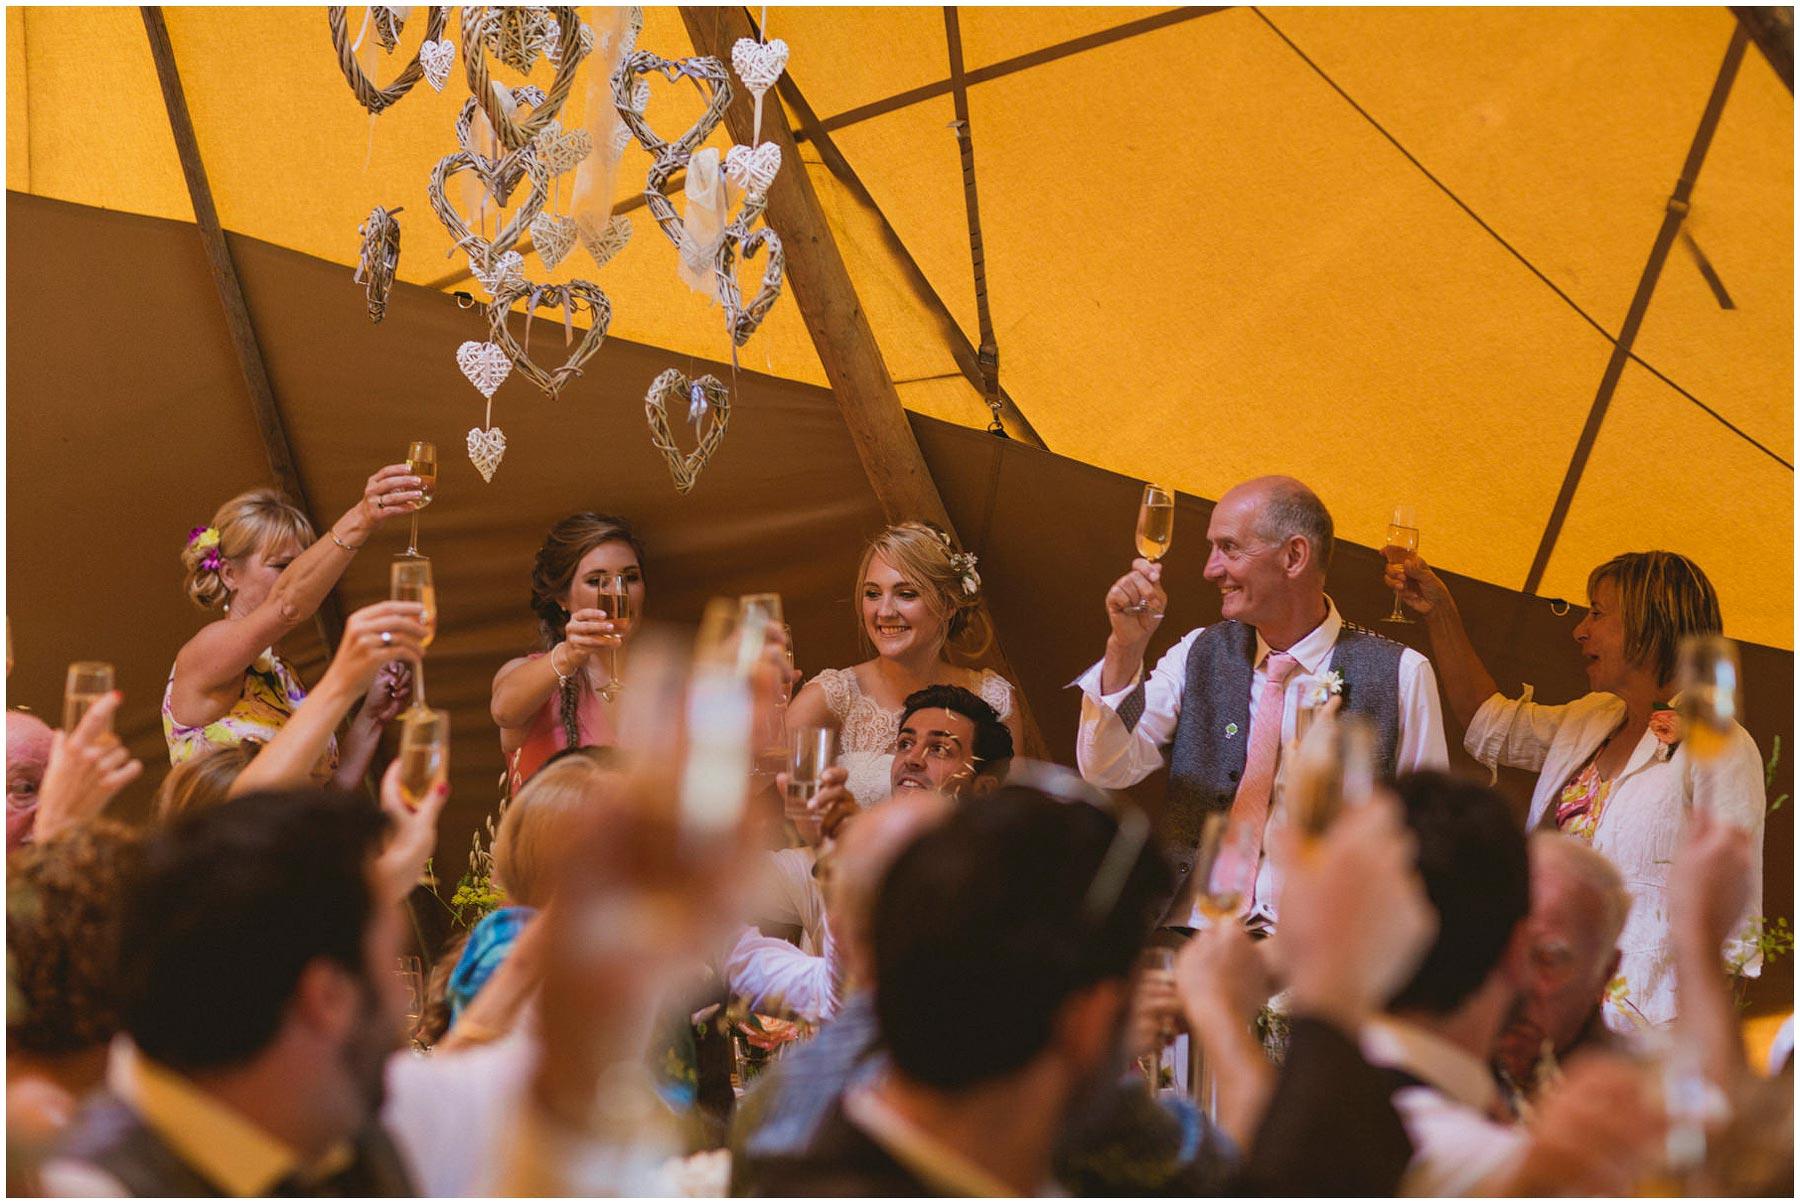 Kent-Festival-Tipi-wedding-photography_0122